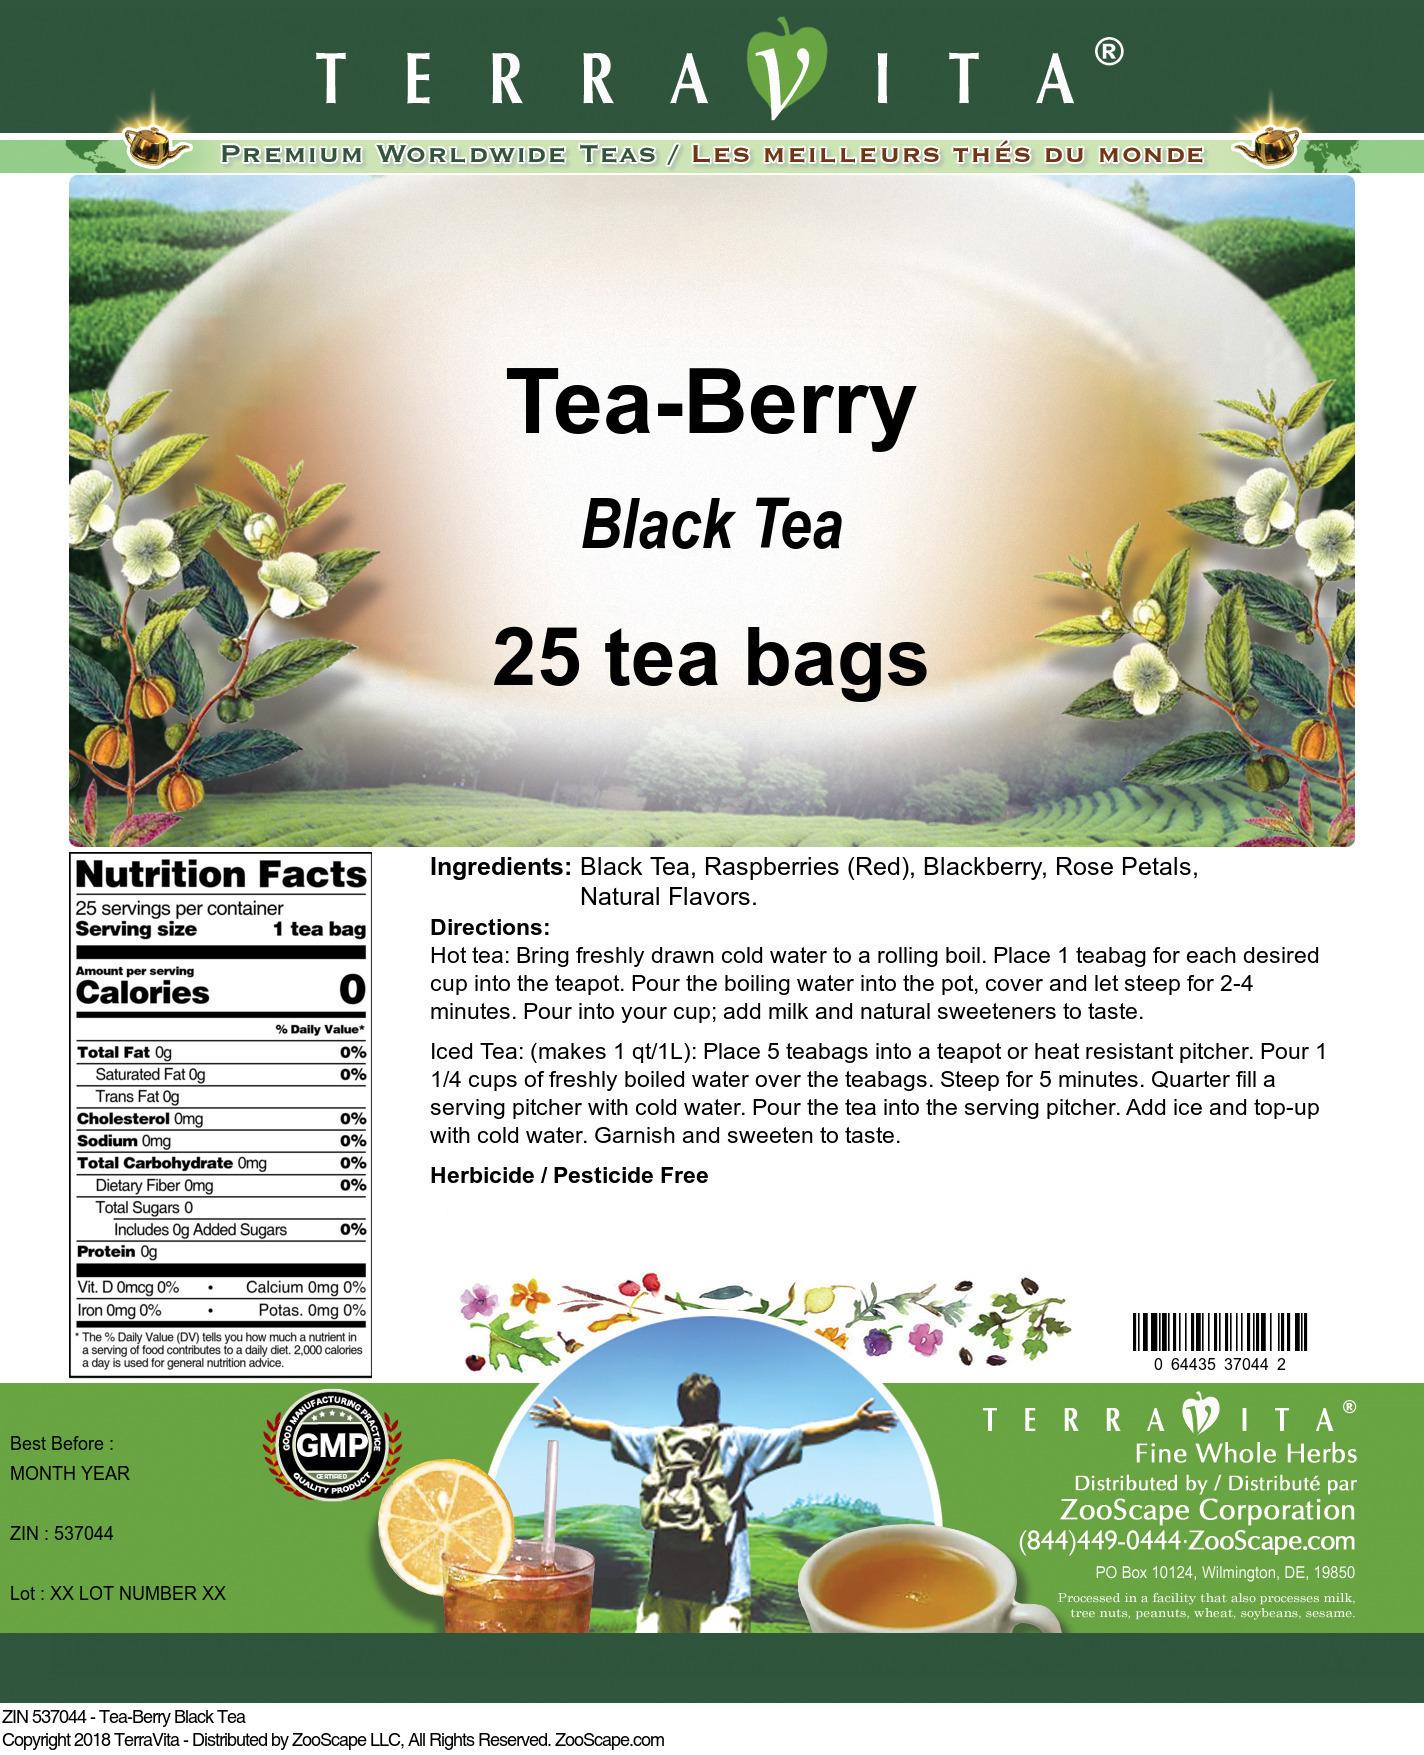 Tea-Berry Black Tea